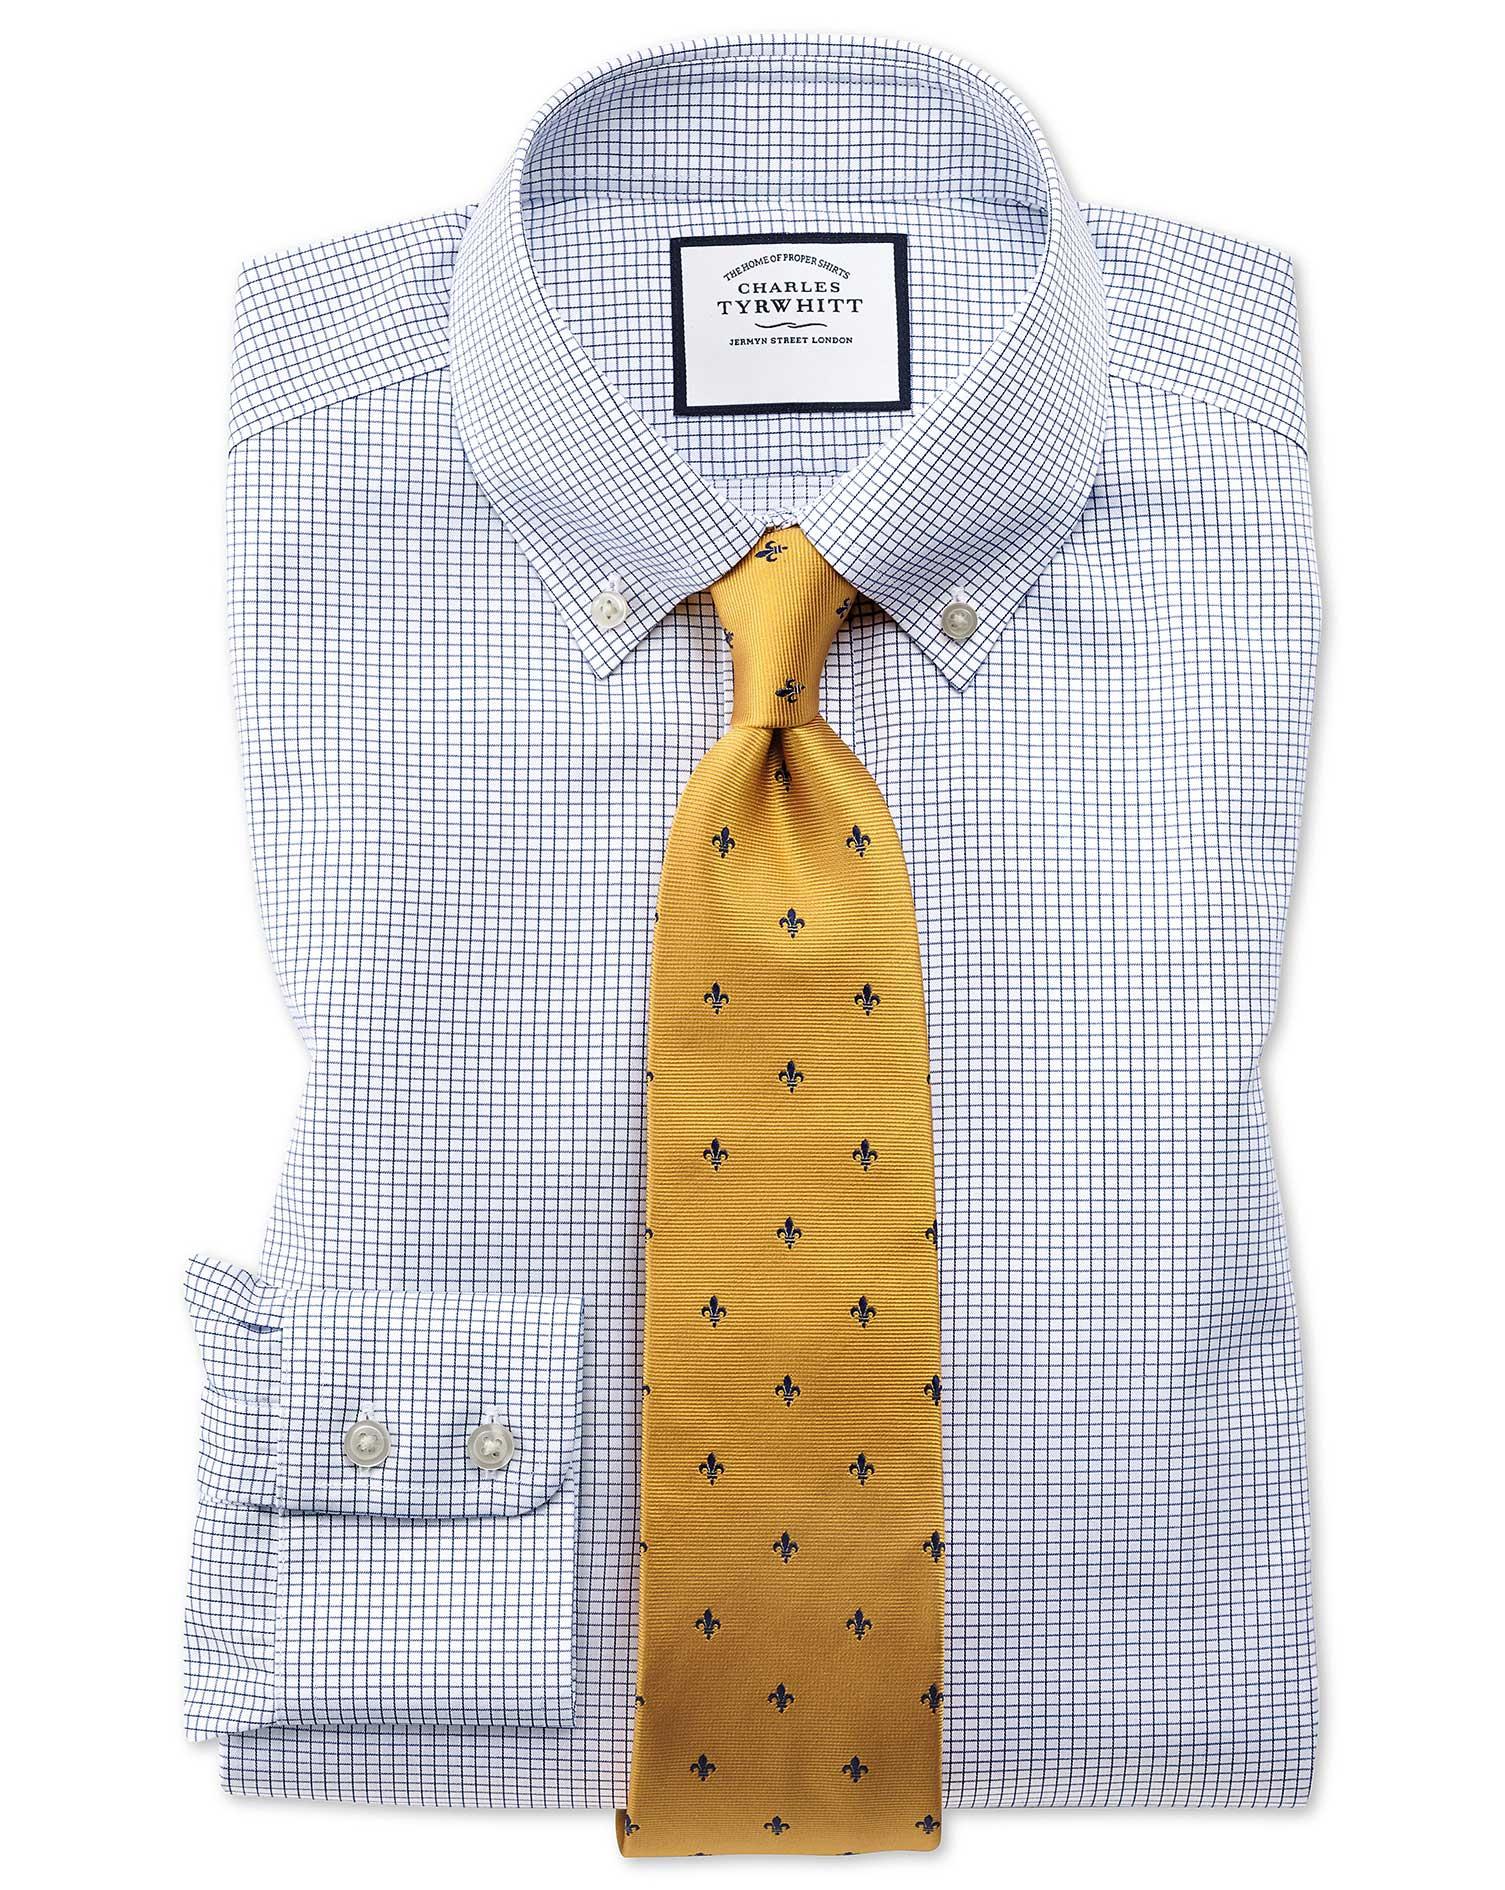 Slim Fit Button-Down Non-Iron Twill Mini Grid Check Navy Cotton Formal Shirt Single Cuff Size 15.5/3